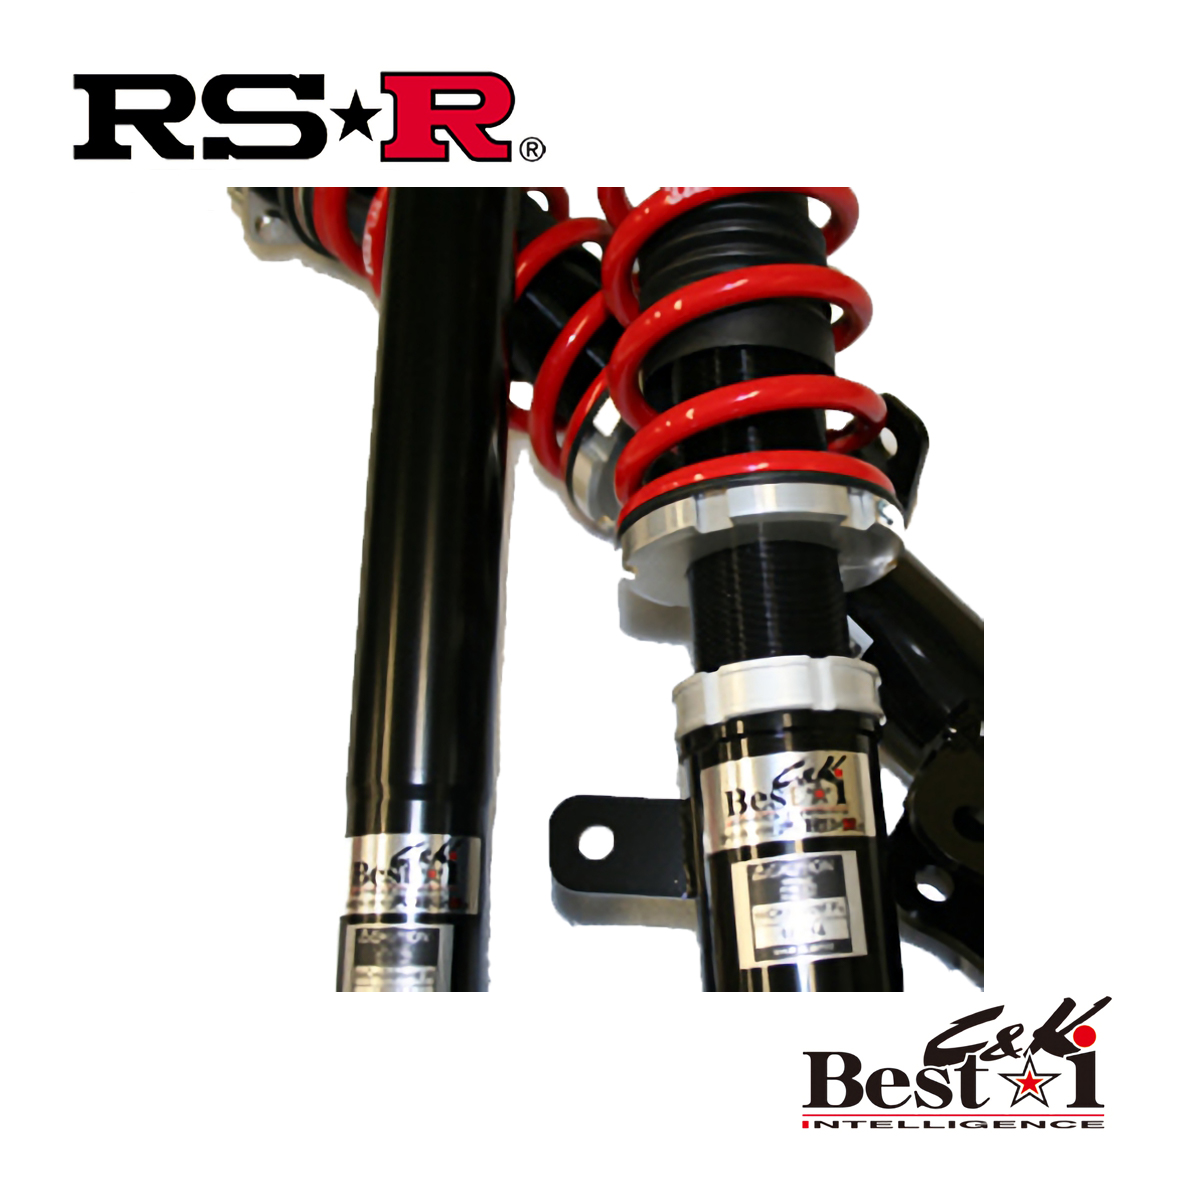 RS-R タント LA650S カスタムRS 車高調 リア車高調整: ネジ式 BICKD401M ベストi C&K RSR 個人宅発送追金有